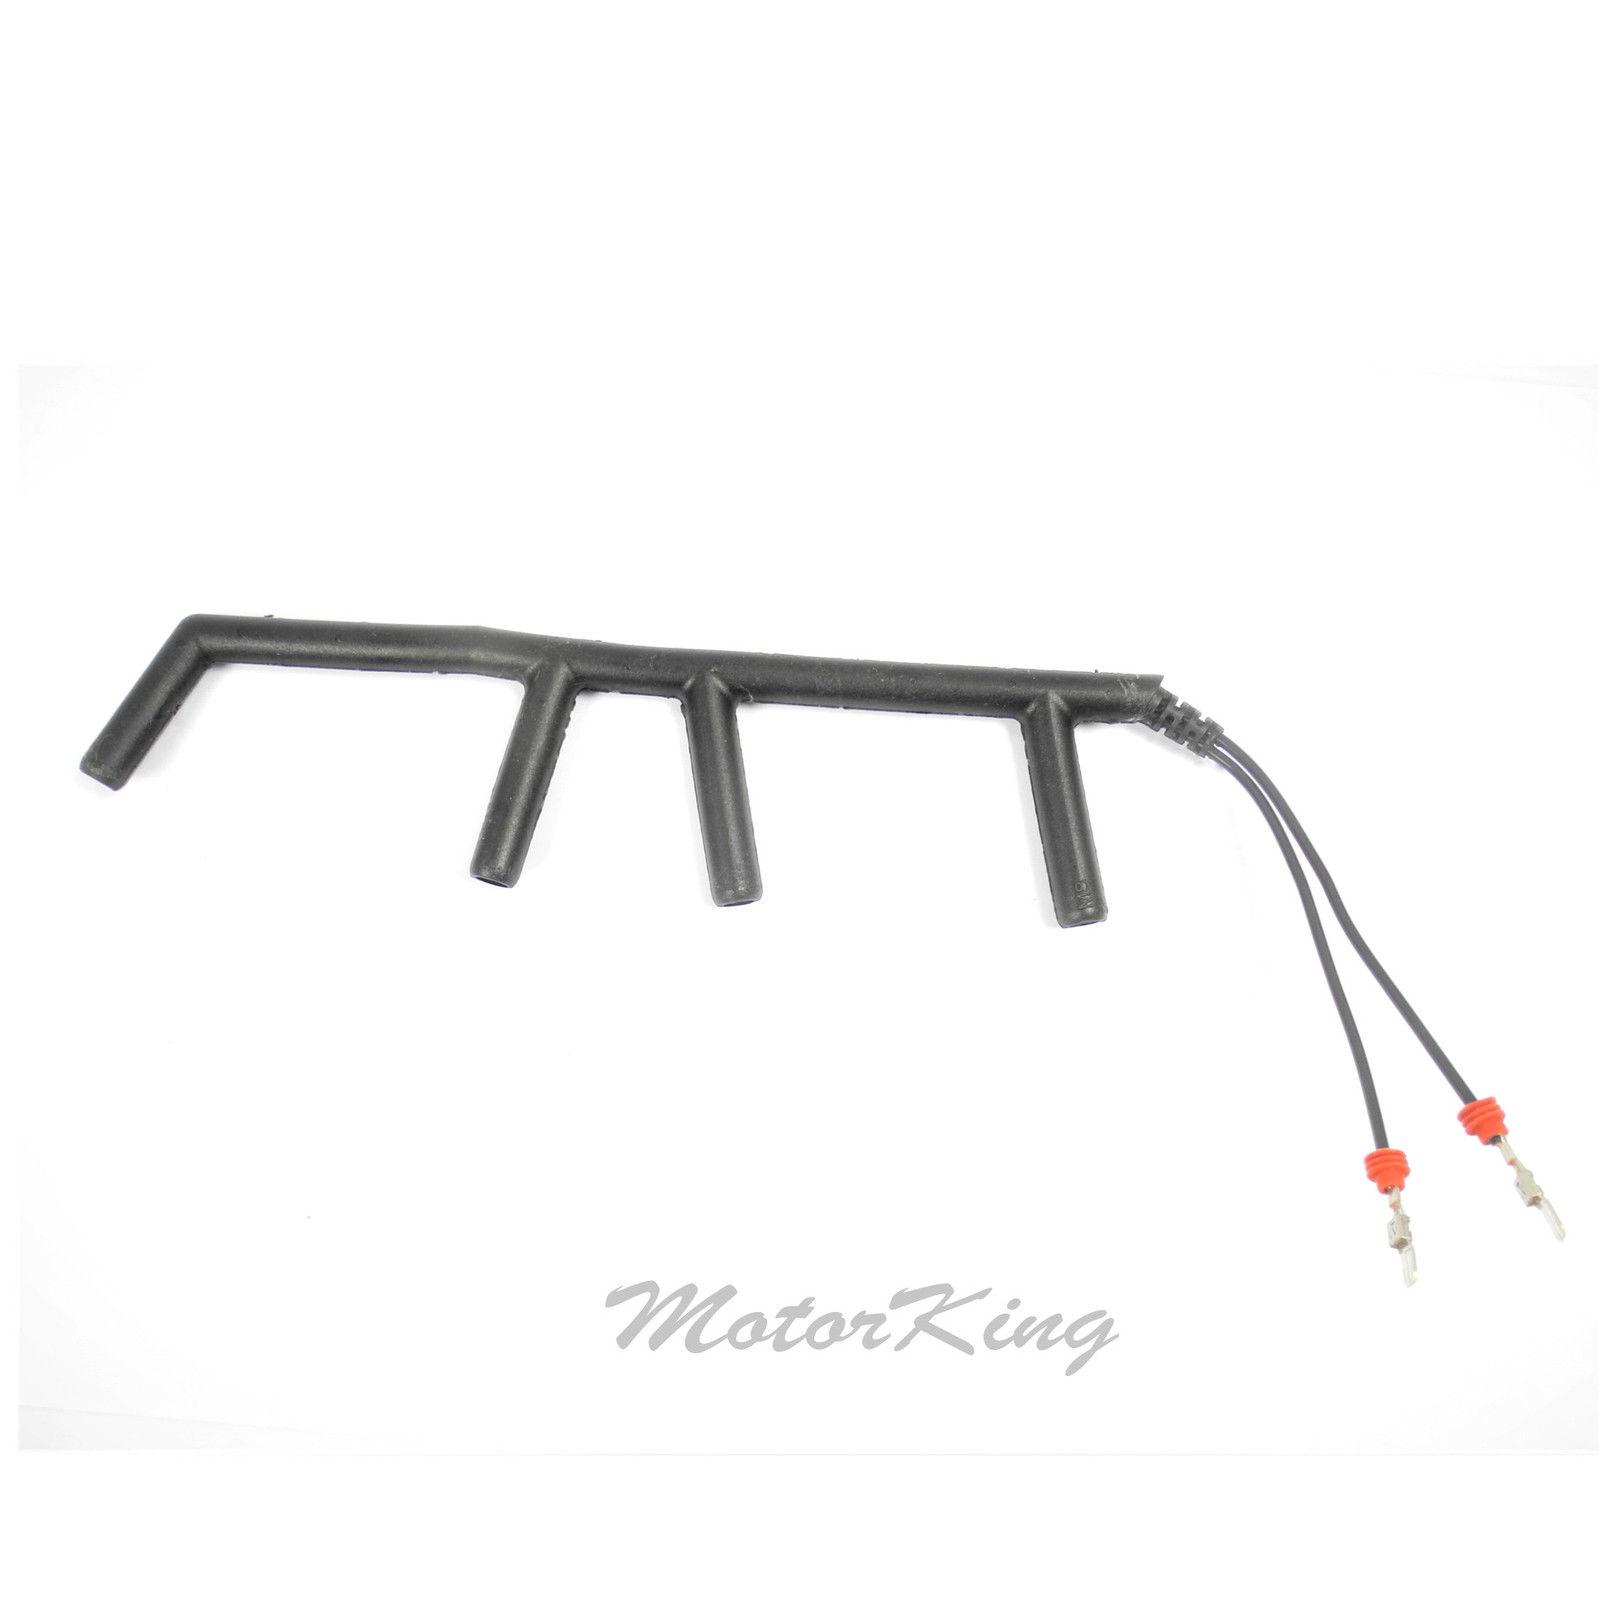 hight resolution of for vw beetle golf jetta passat 1 9 2 wire glow plug wiring harness 028971766